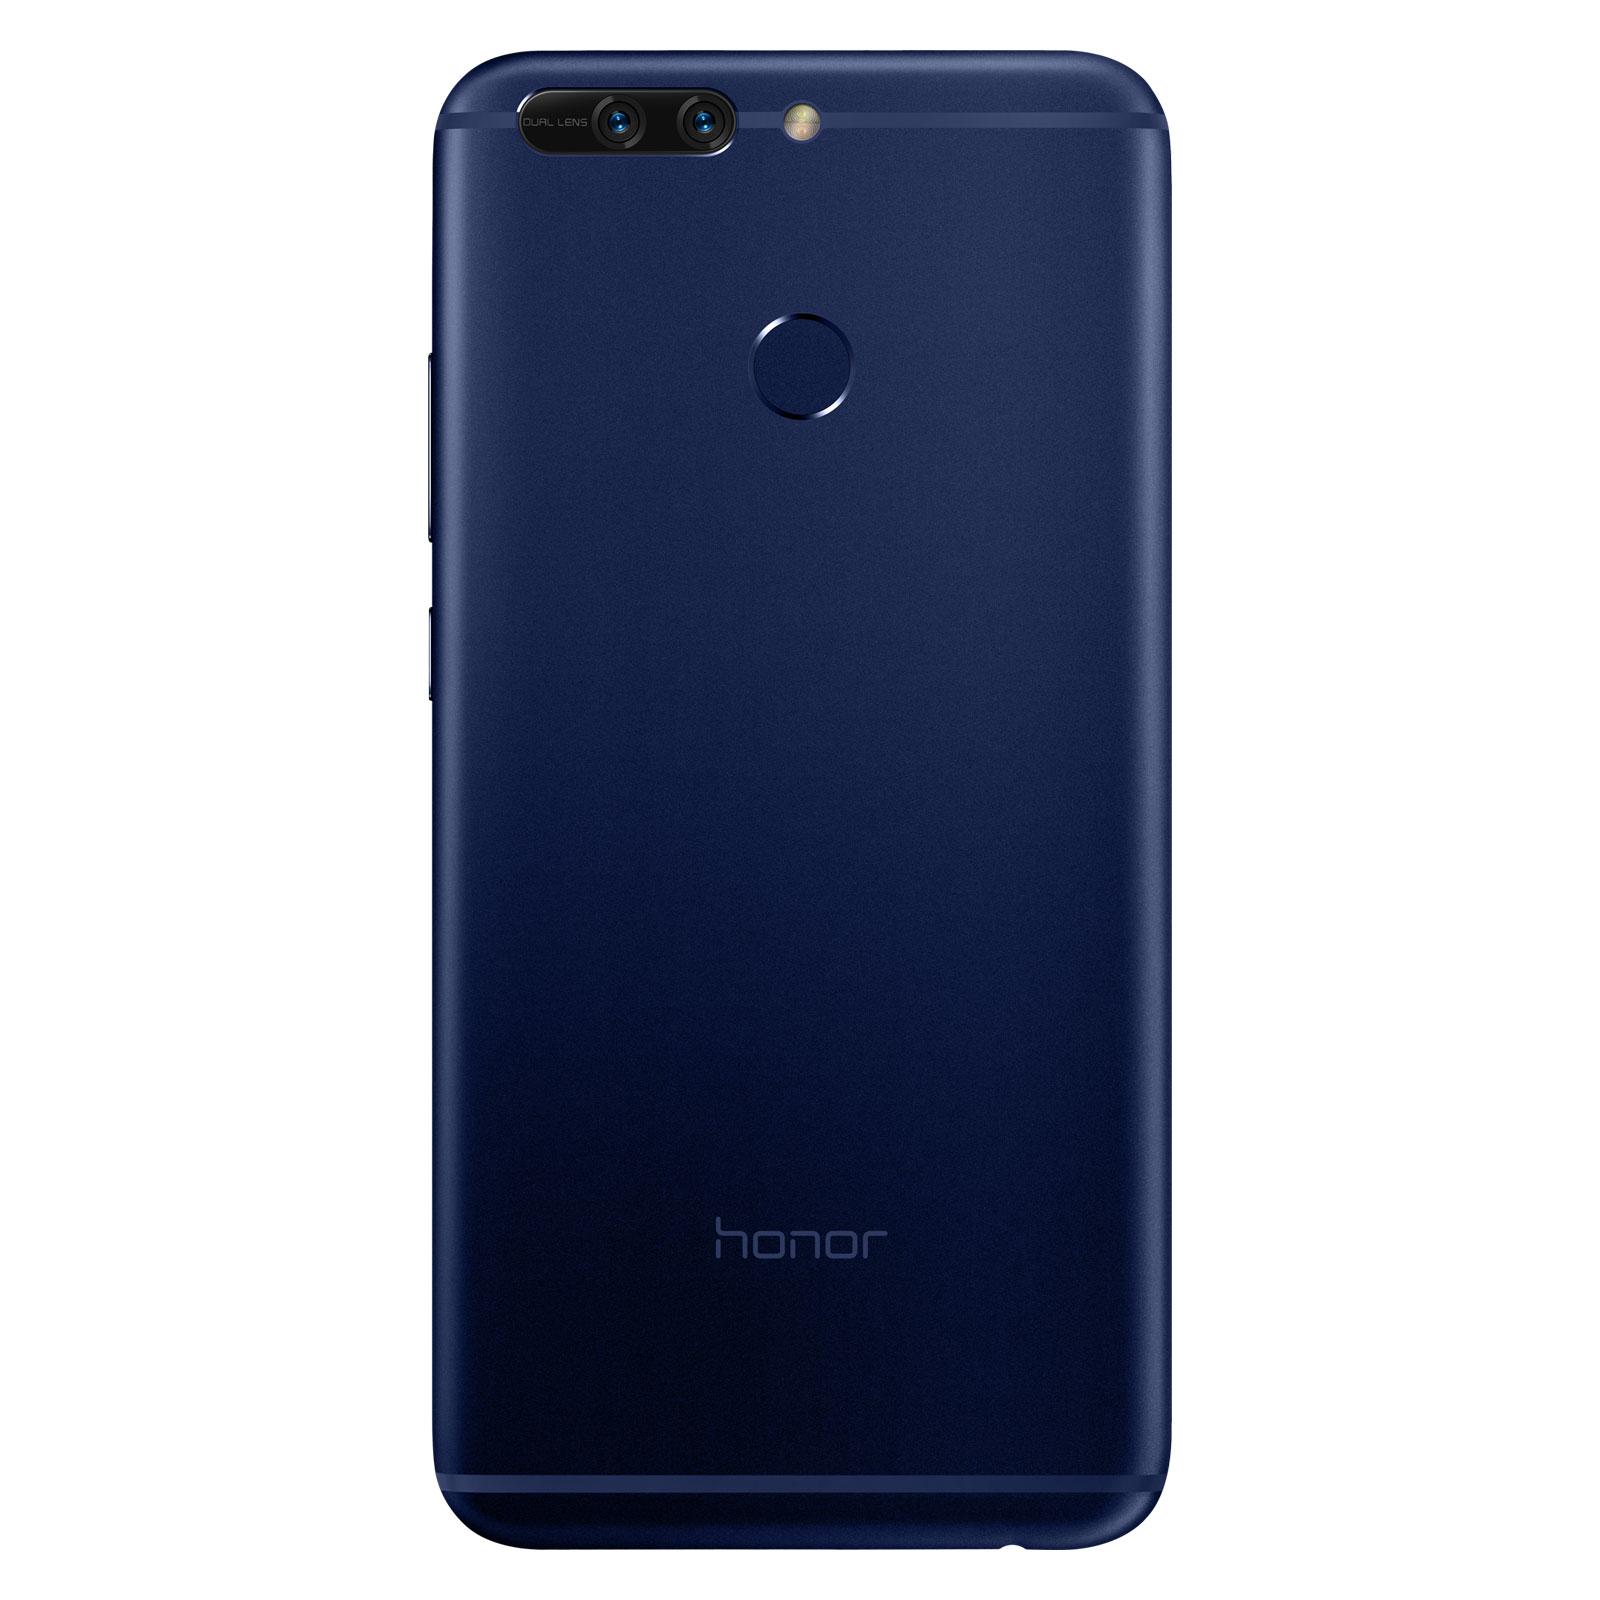 Honor 8 pro bleu 64 go mobile smartphone honor sur ldlc for Photo ecran honor 7